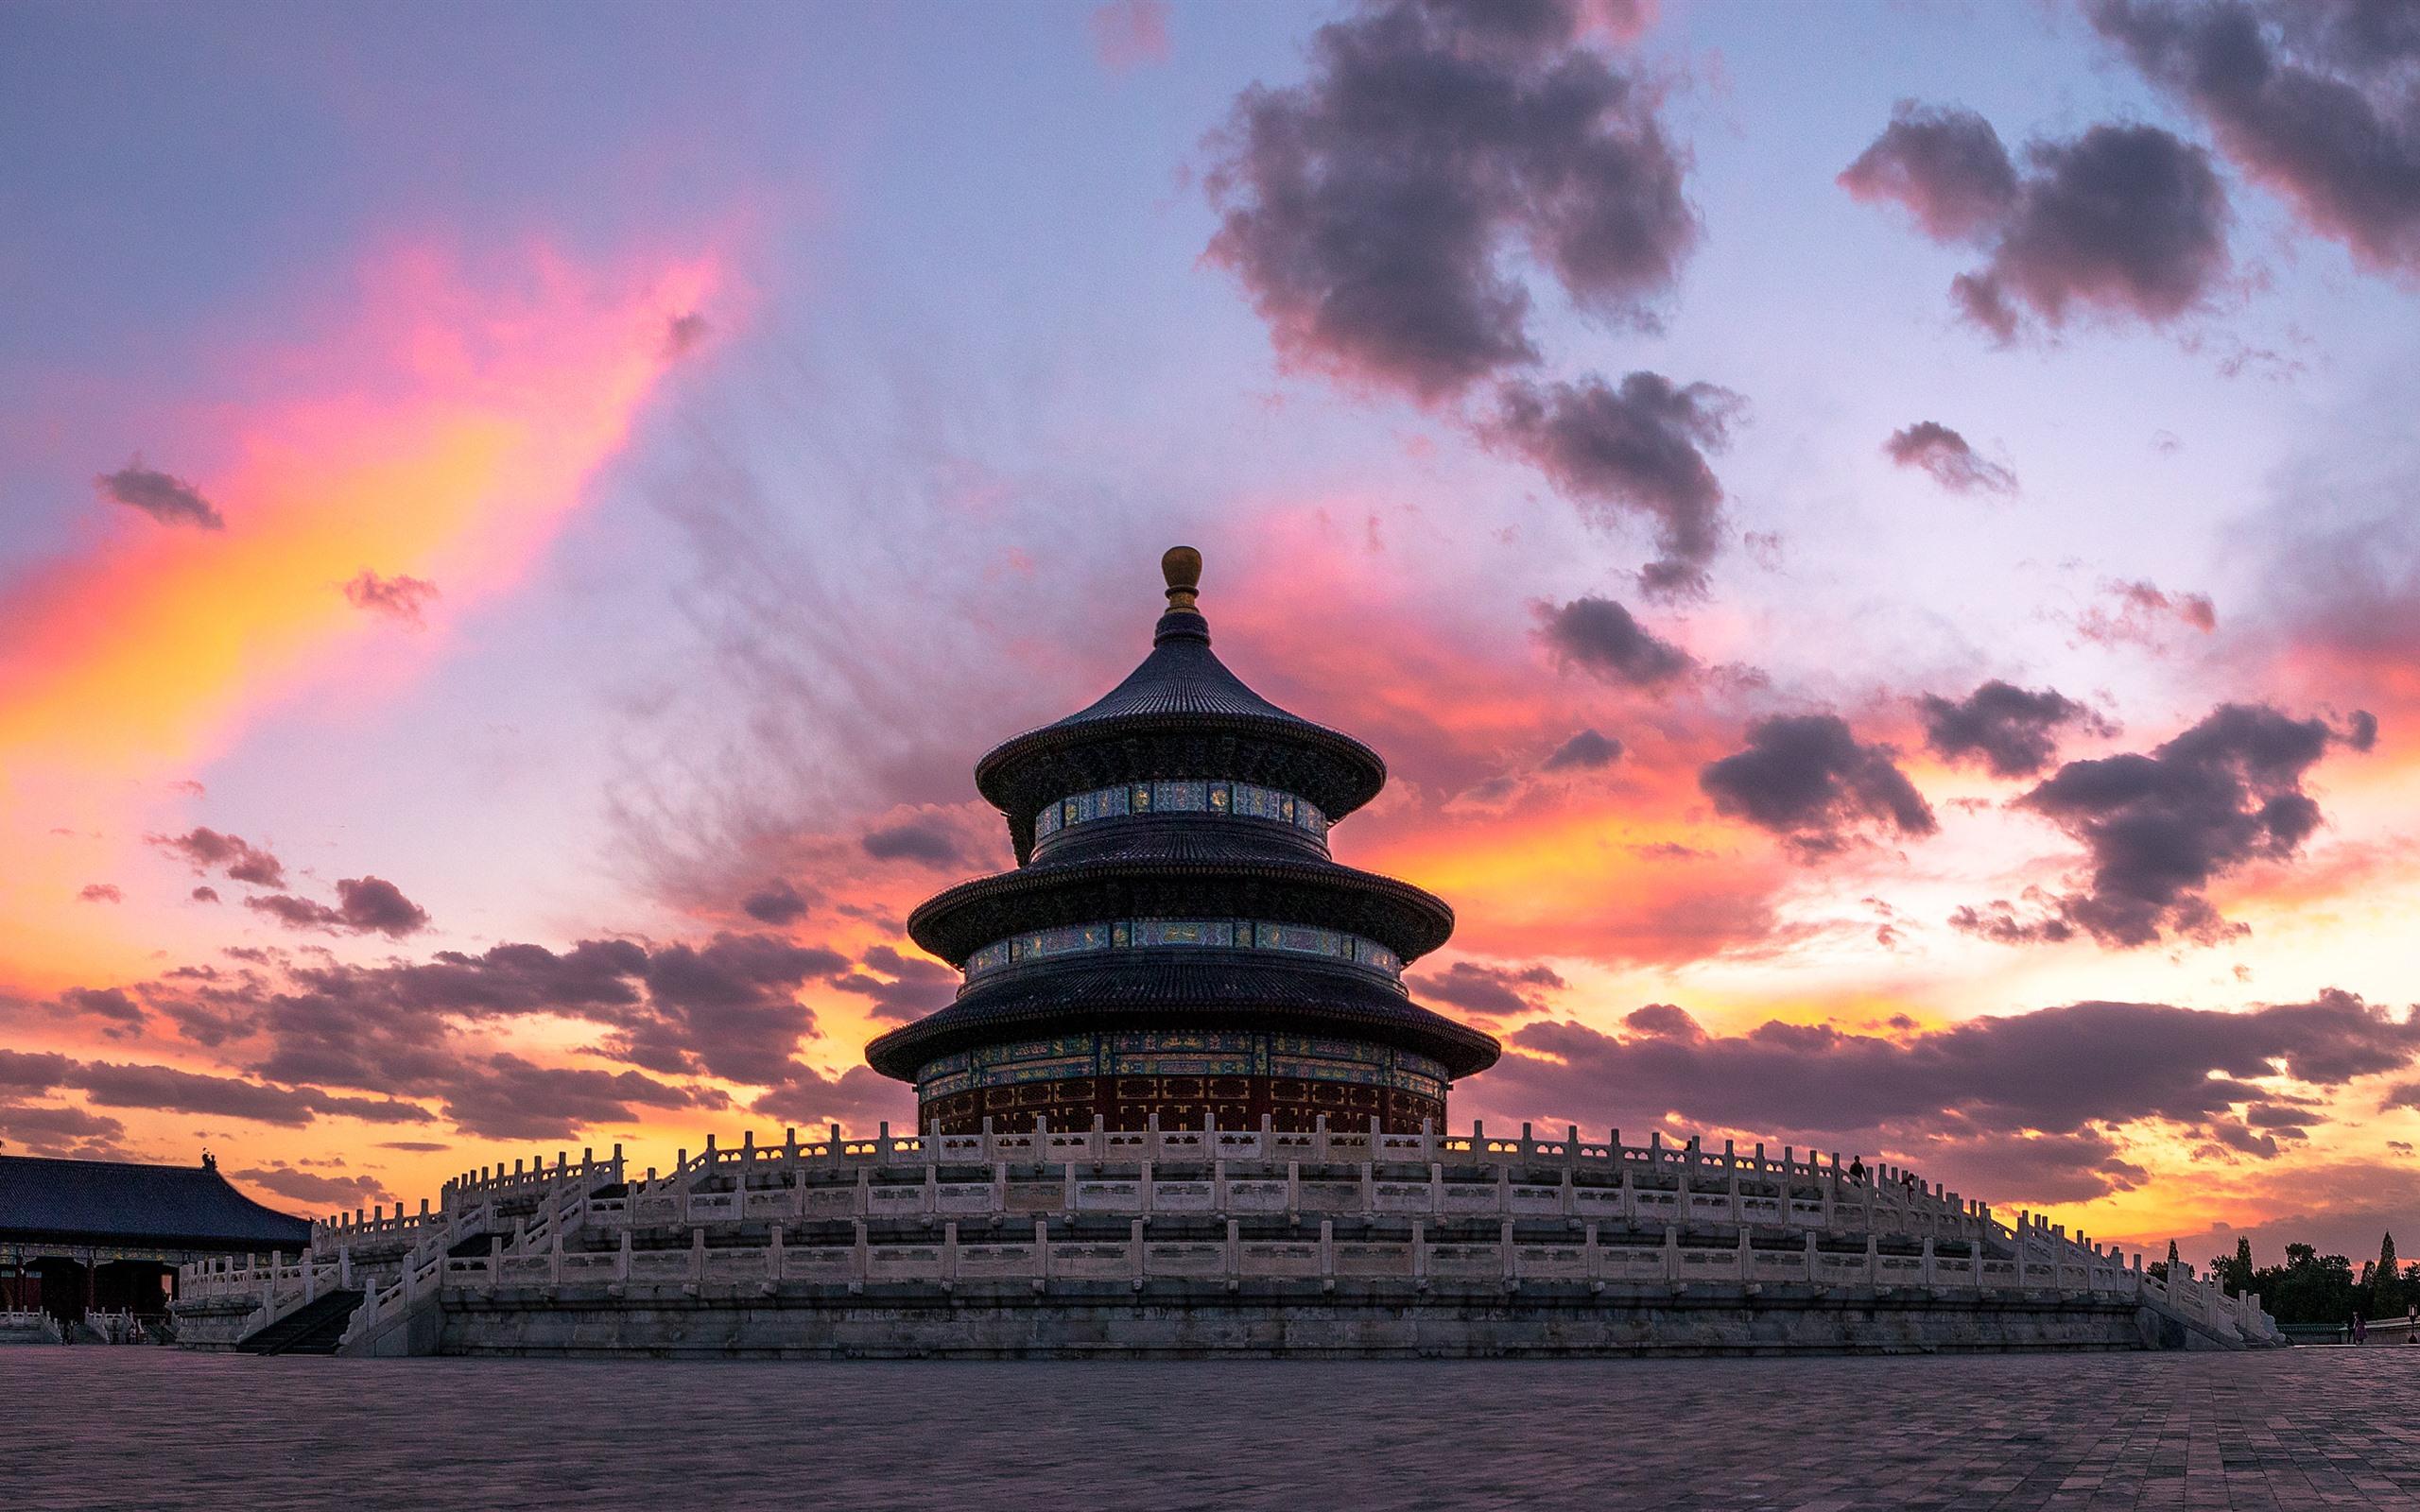 Wallpaper Temple Of Heaven Beijing China 2560x1600 Hd